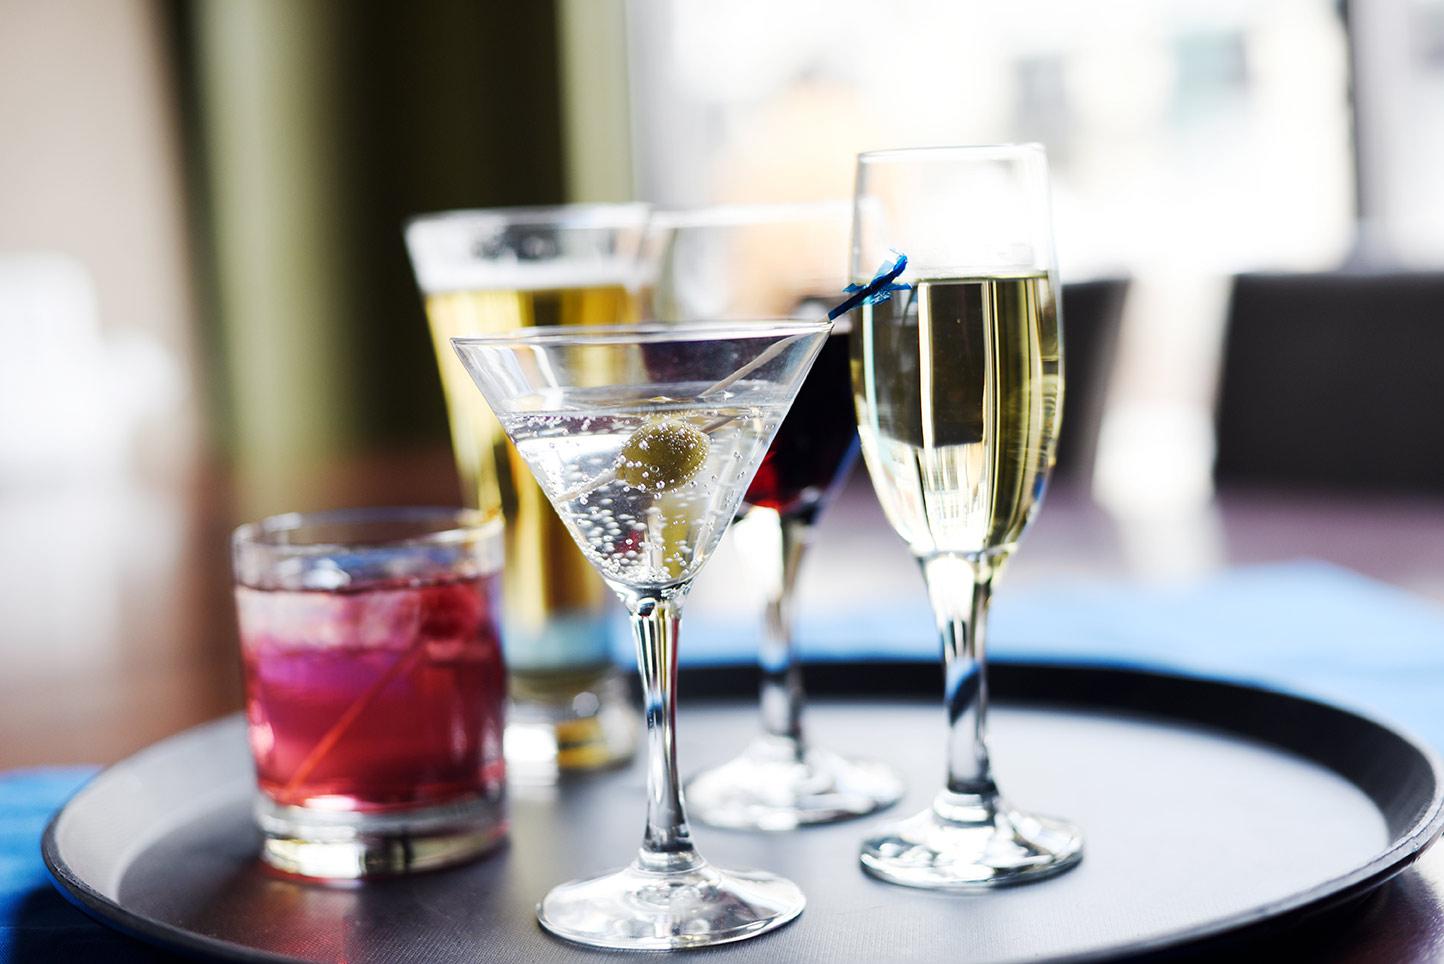 040218-KP-cocktails-6